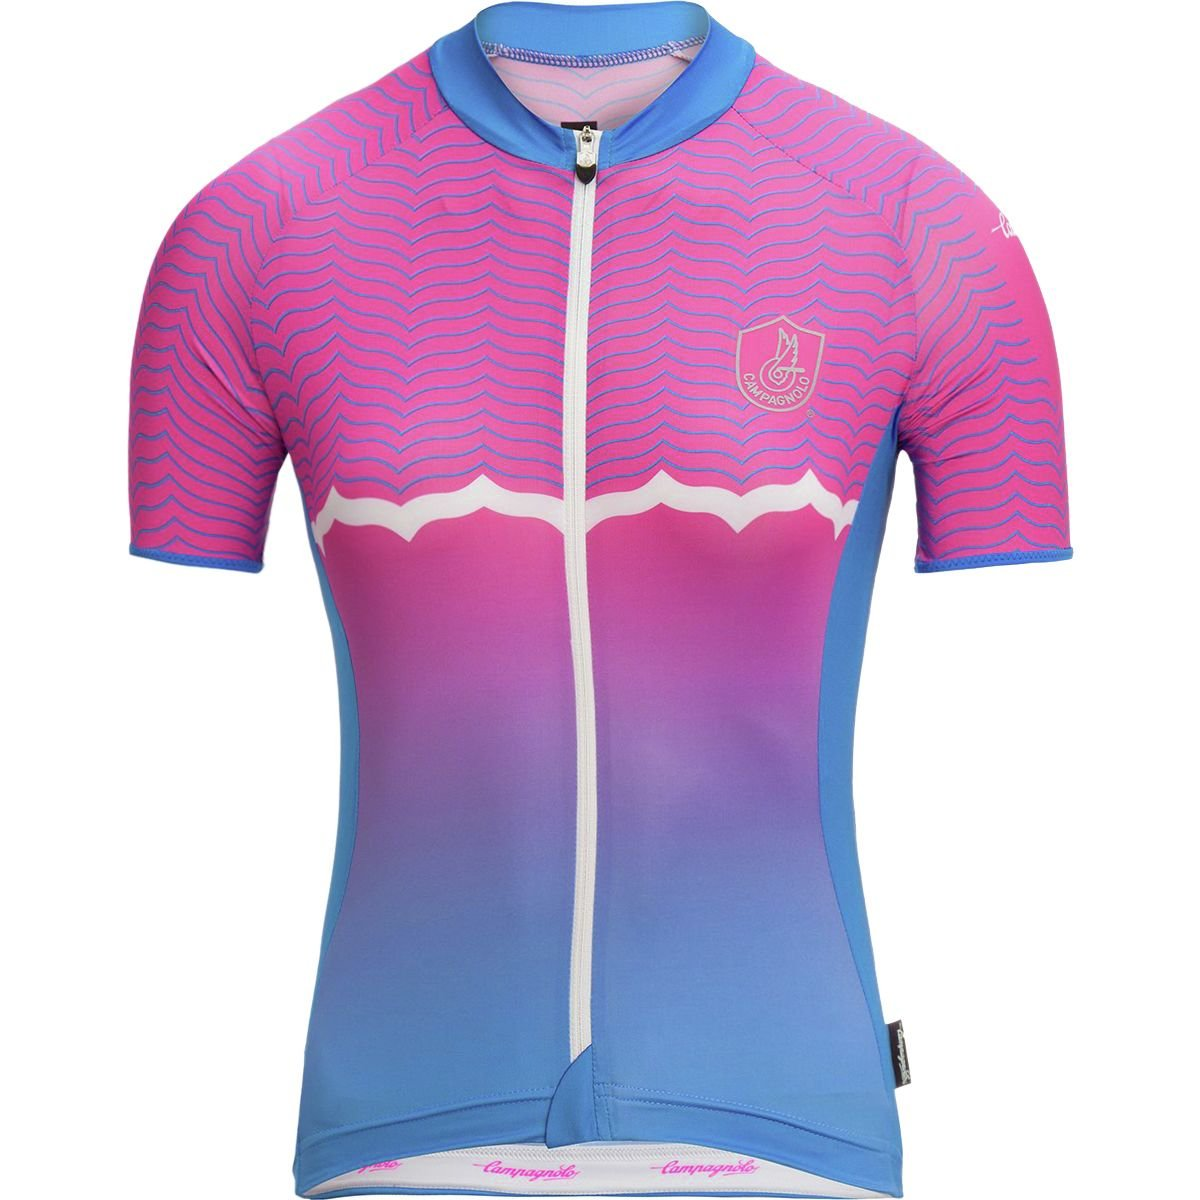 Campagnolo Quarzo Jersey – Women 's B07F2G3923  ブルー Large